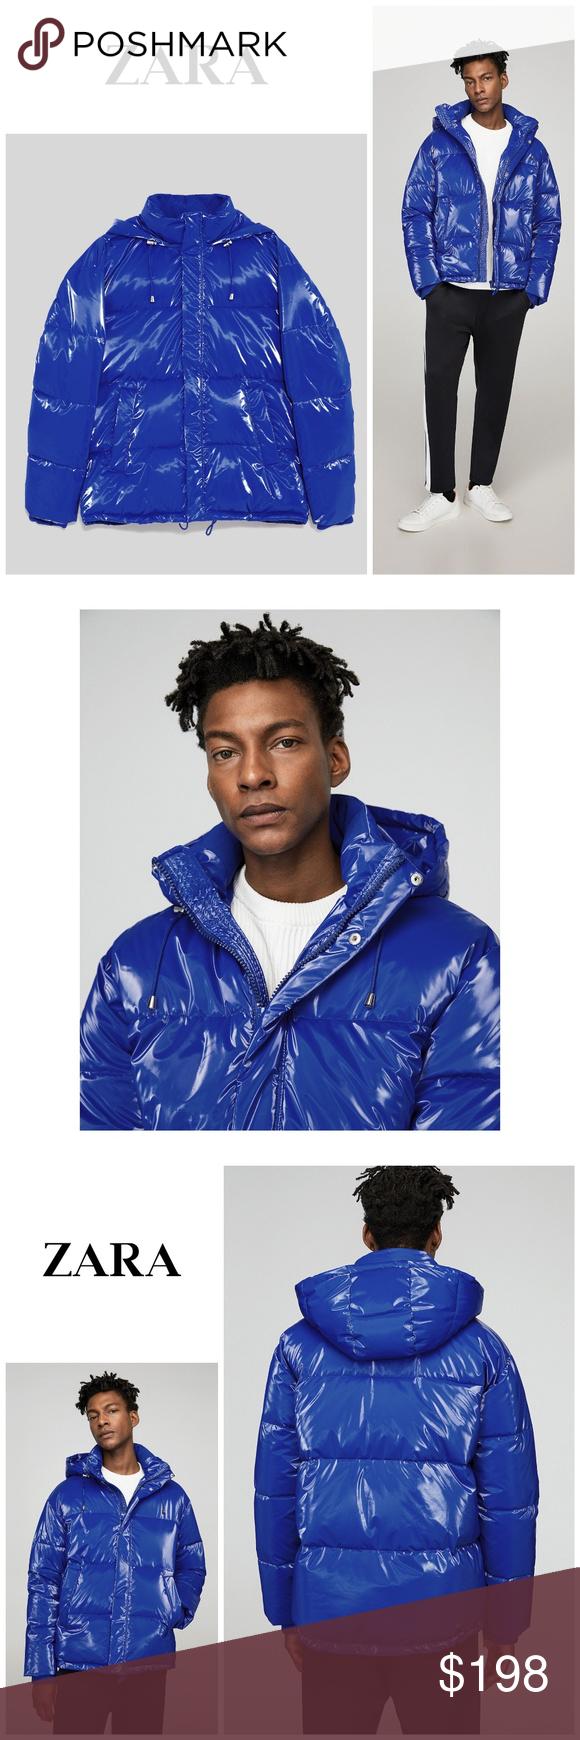 Nwt Zara Man Blue Vinyl Effect Puffer Jacket Clothes Design Fashion Fashion Design